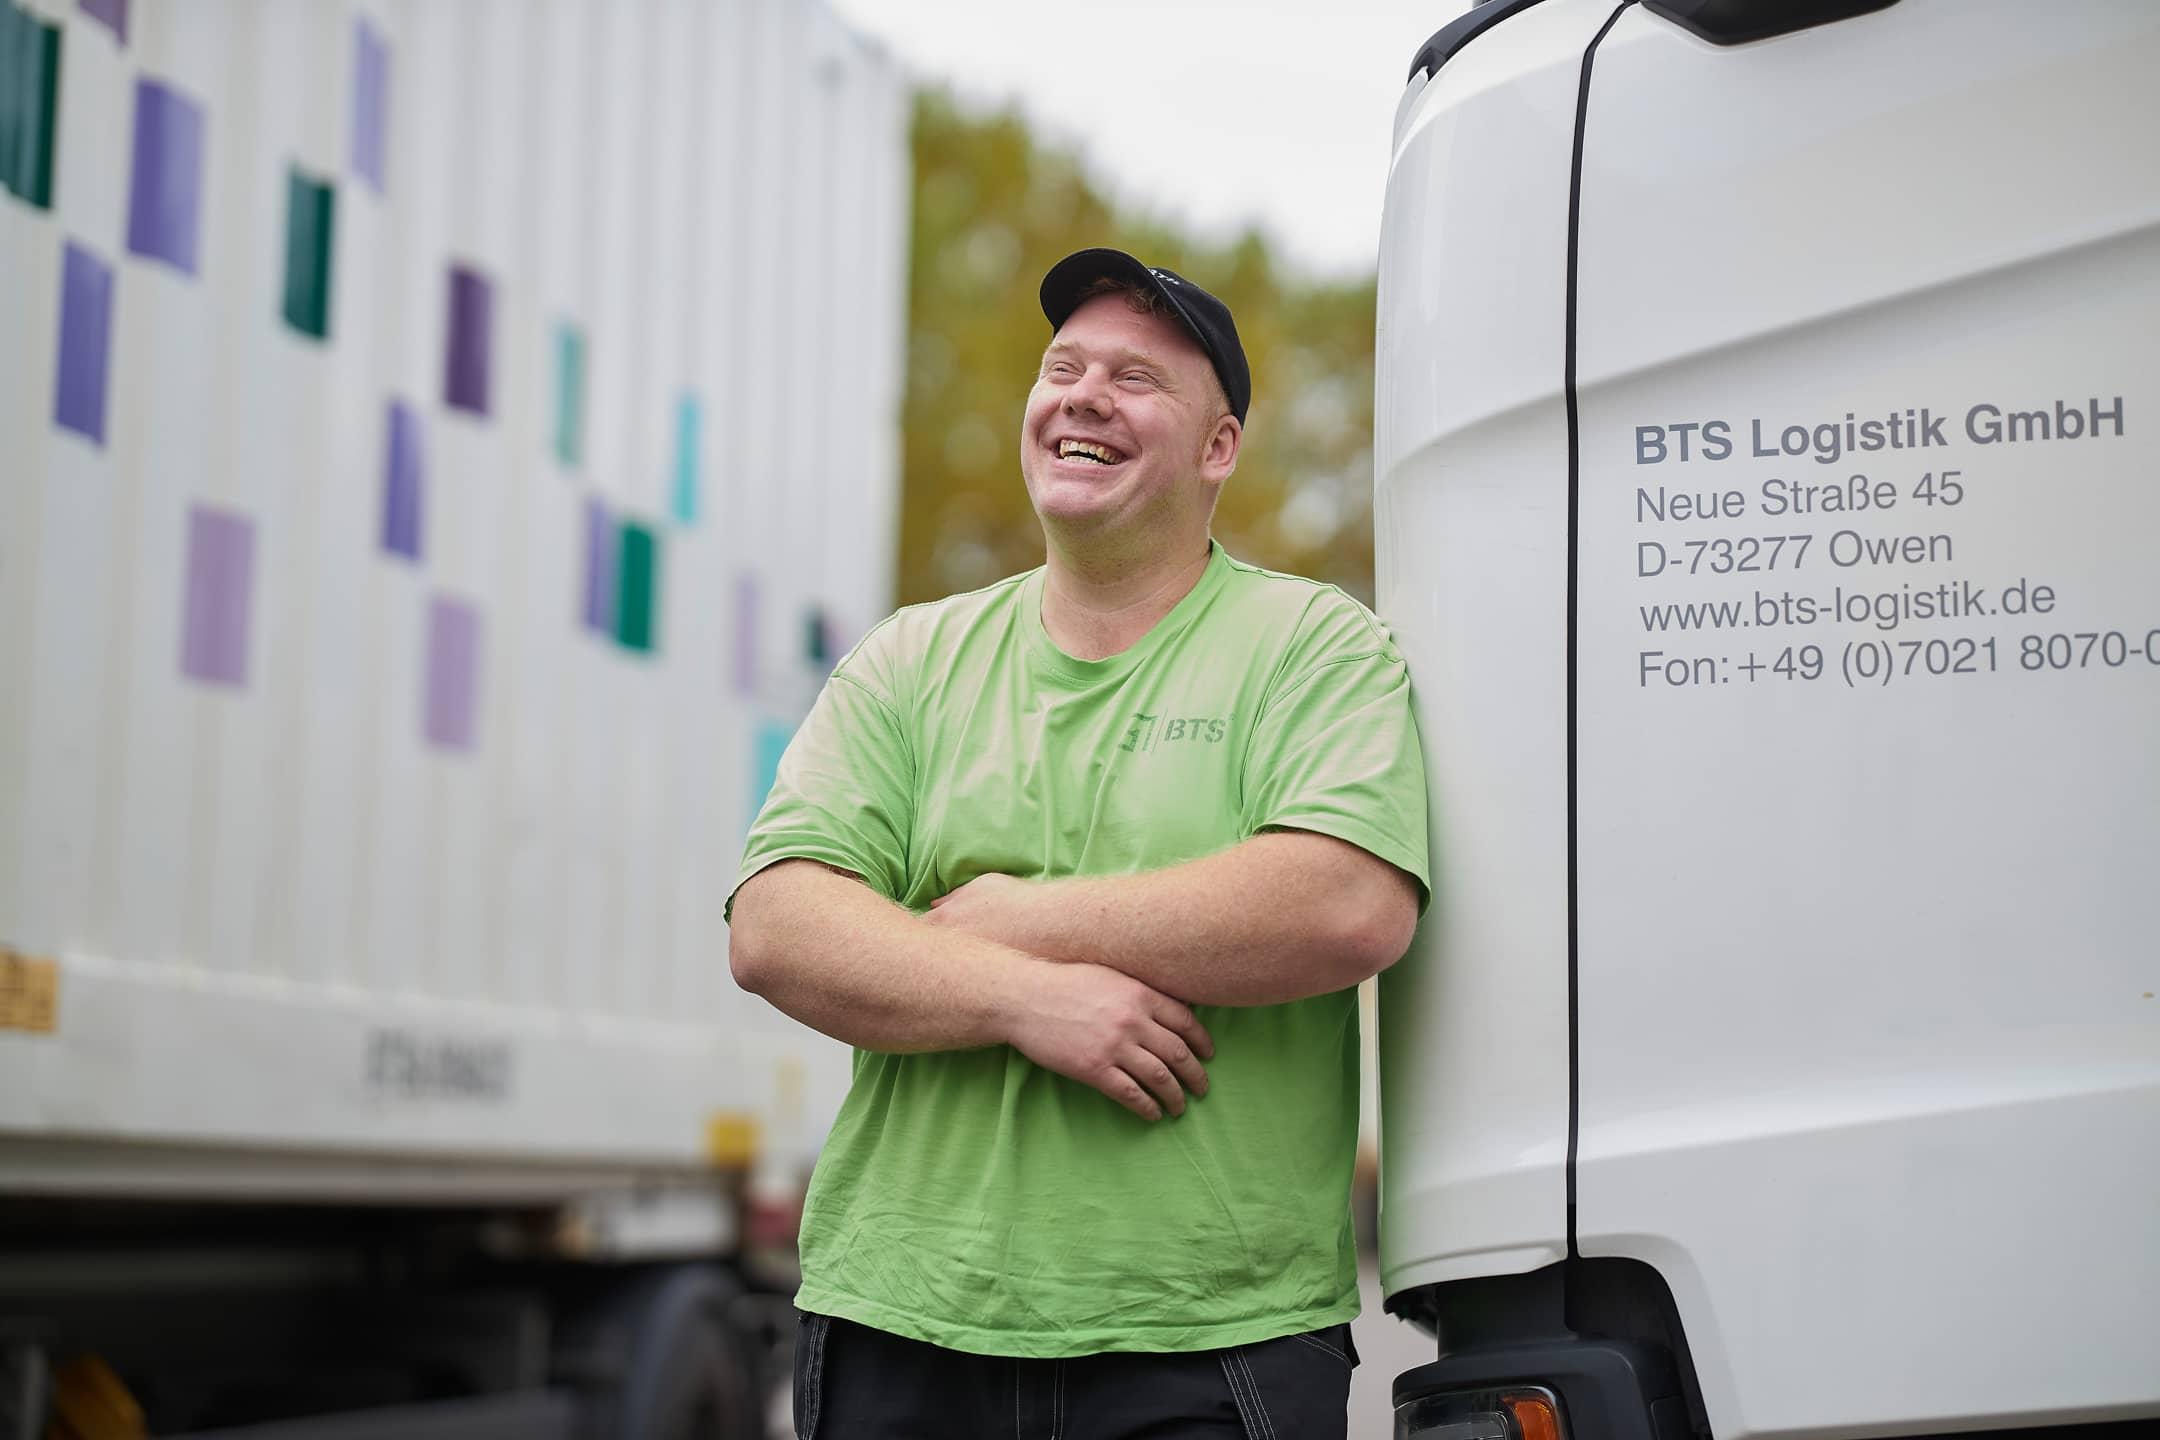 BTS Logistik GmbH in Owen Fahrer